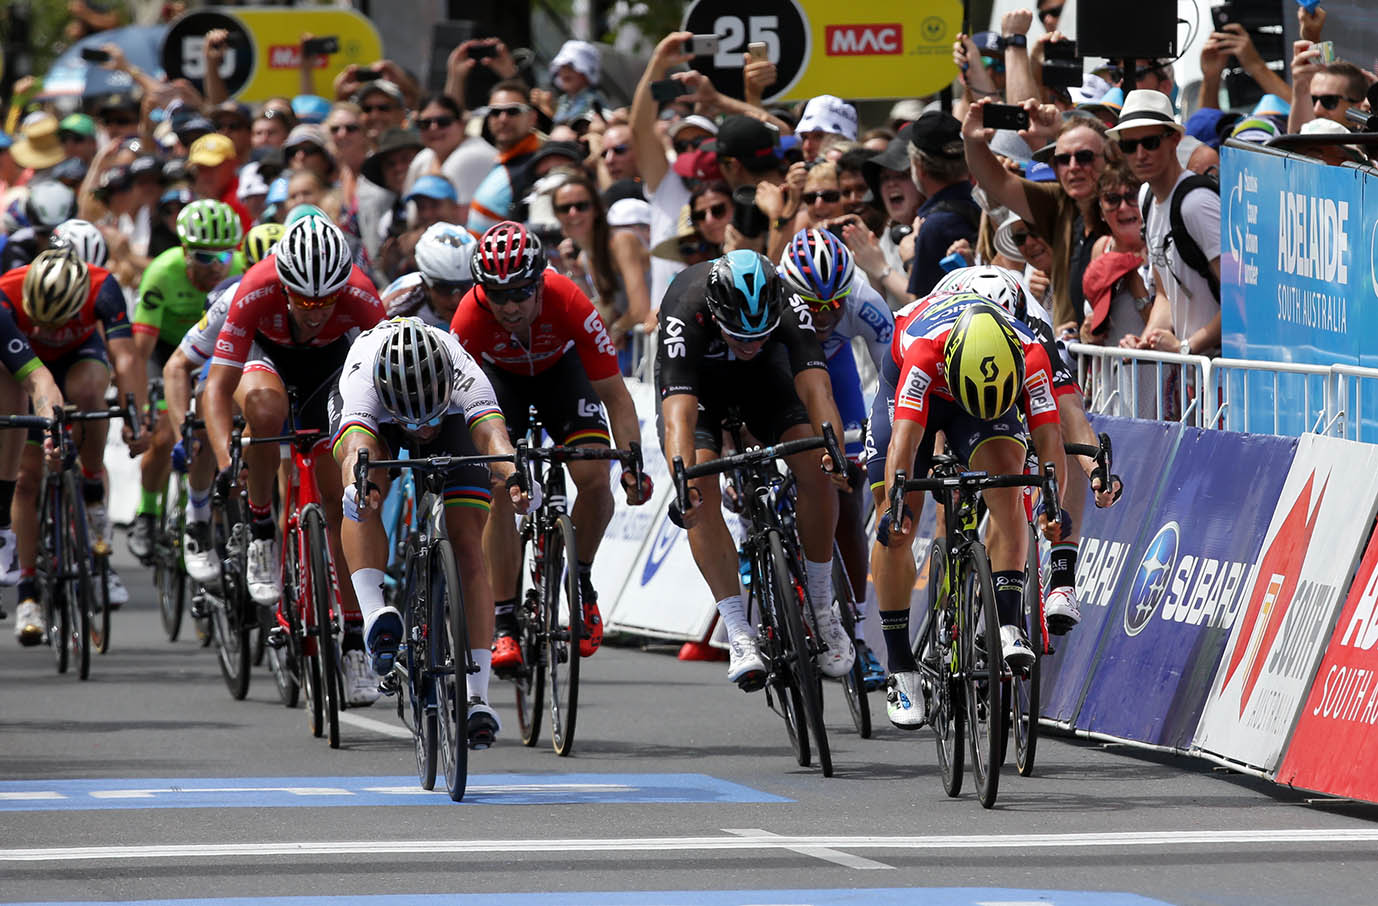 Caleb Ewan ORICA-SCOTT) wins Be Safe Be Seen, MAC Stage 6 of the Santos Tour Down Under